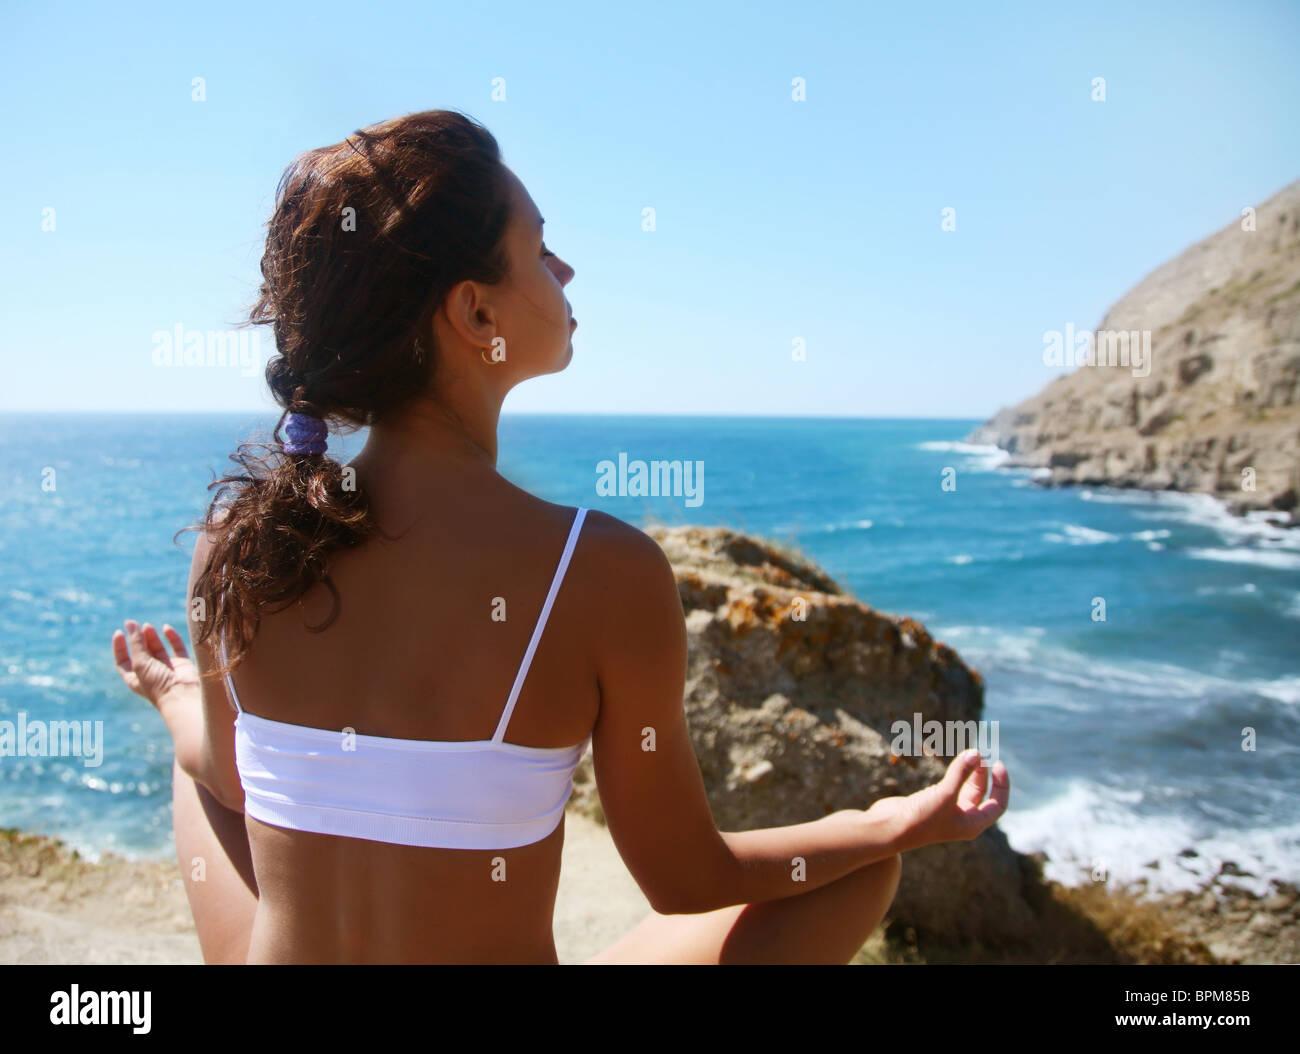 Woman meditating on a rocky seashore - Stock Image